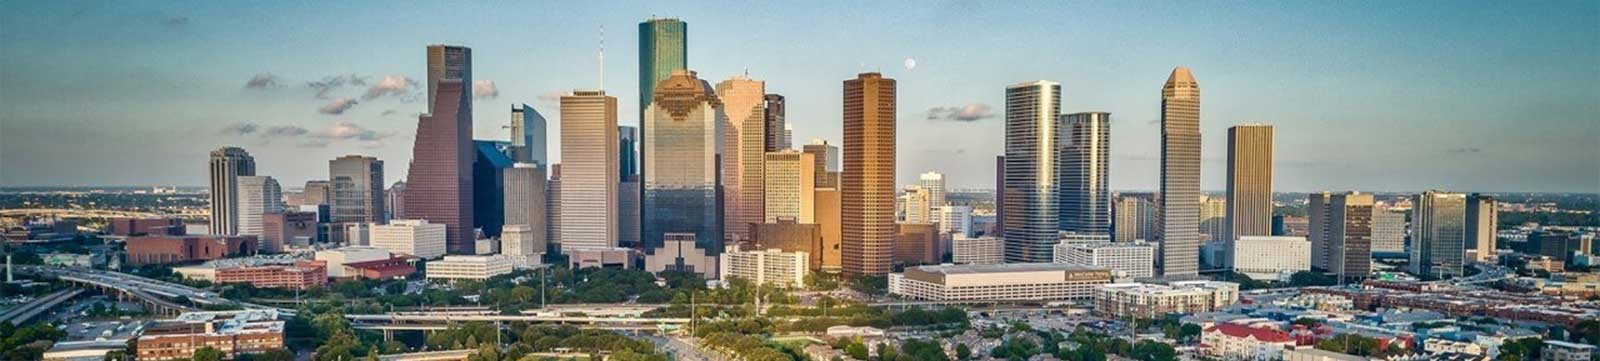 Stanley Automotive Finance Enterprise Houston